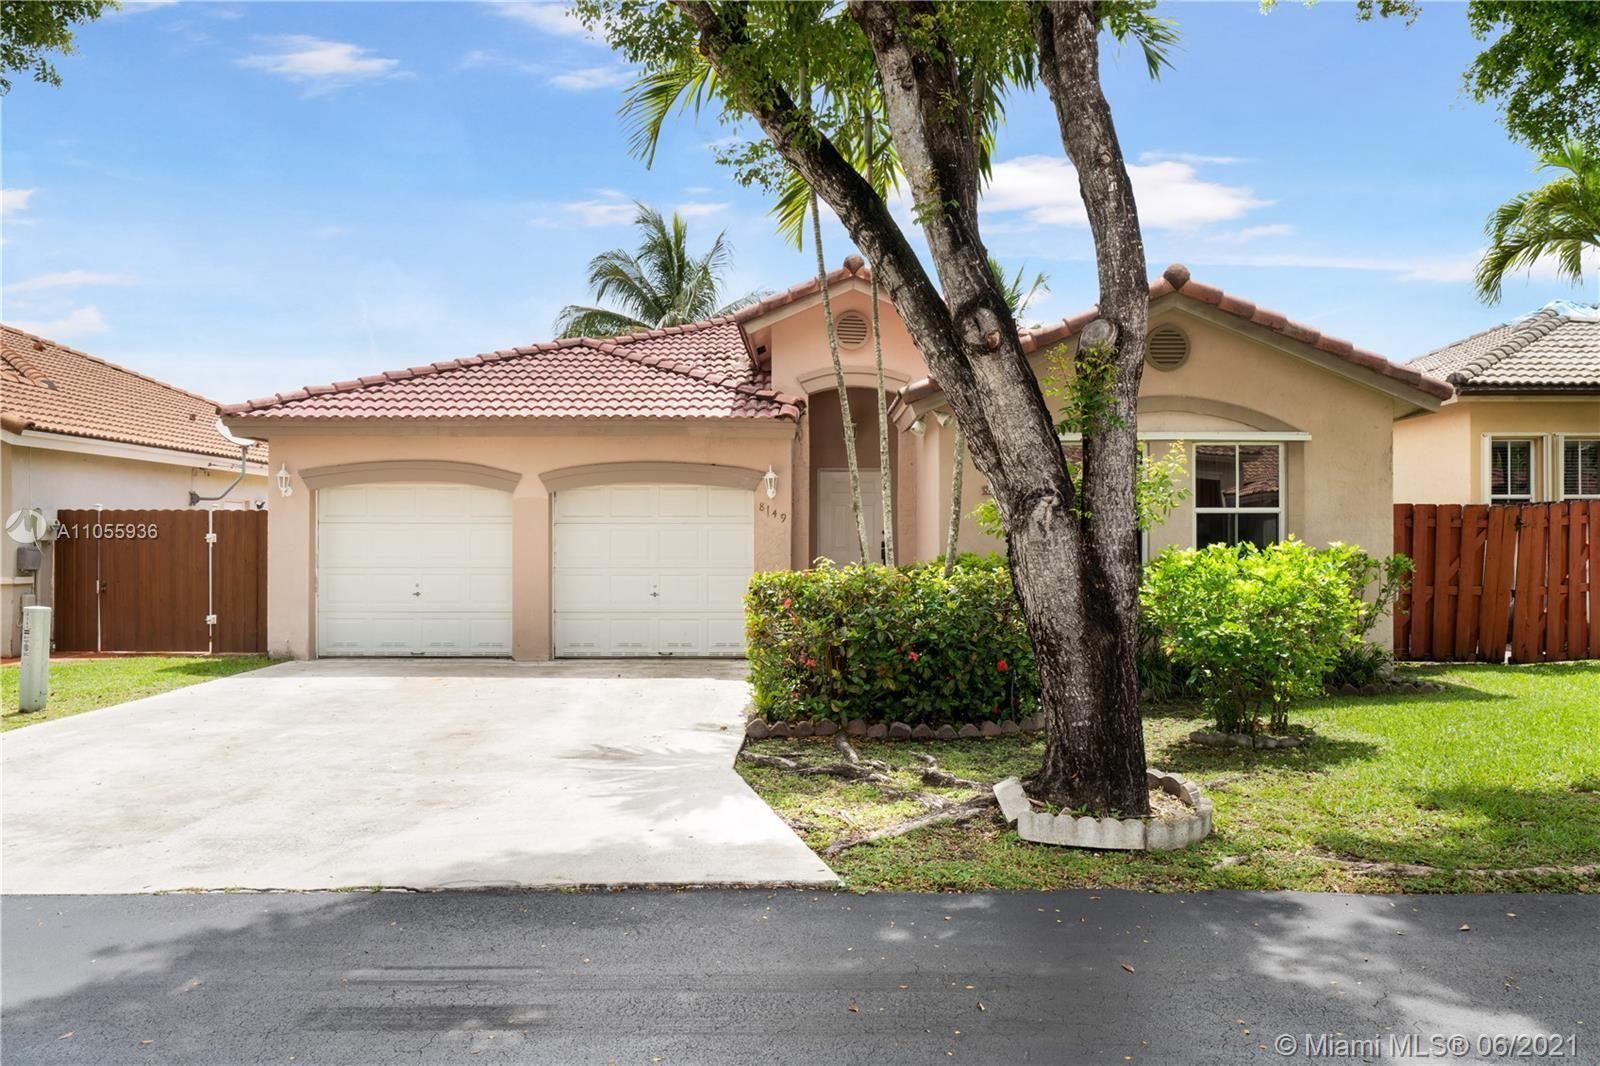 8149 SW 163rd Pl, Miami, FL 33193 - #: A11055936